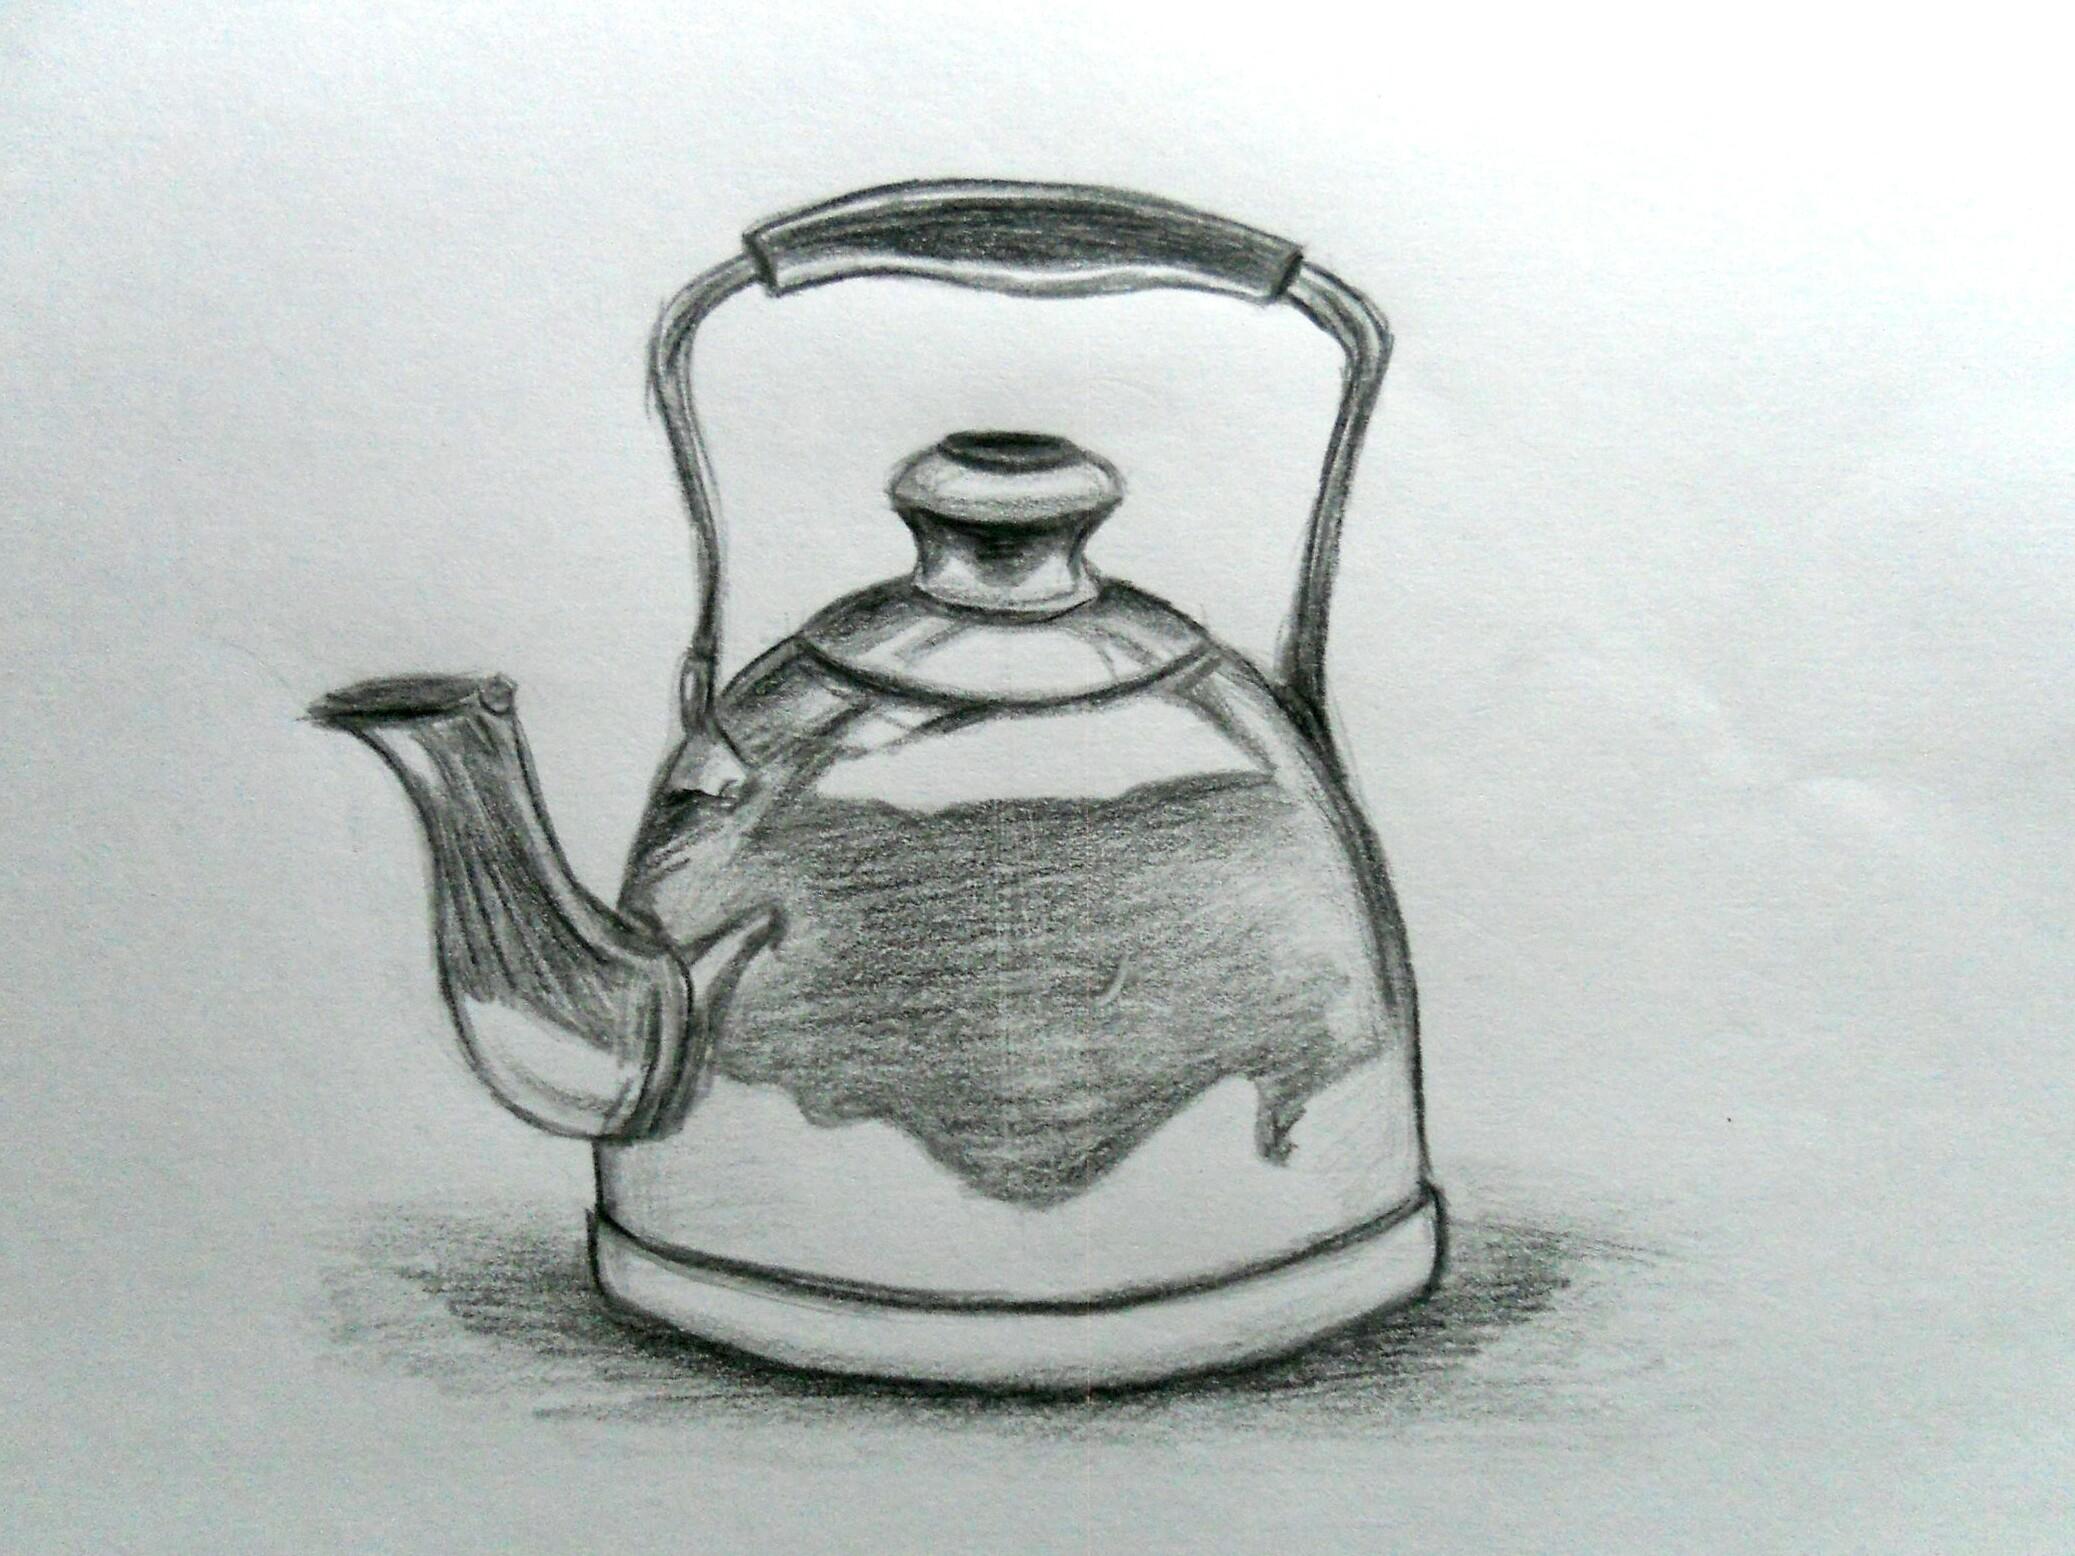 нарисованный чайник